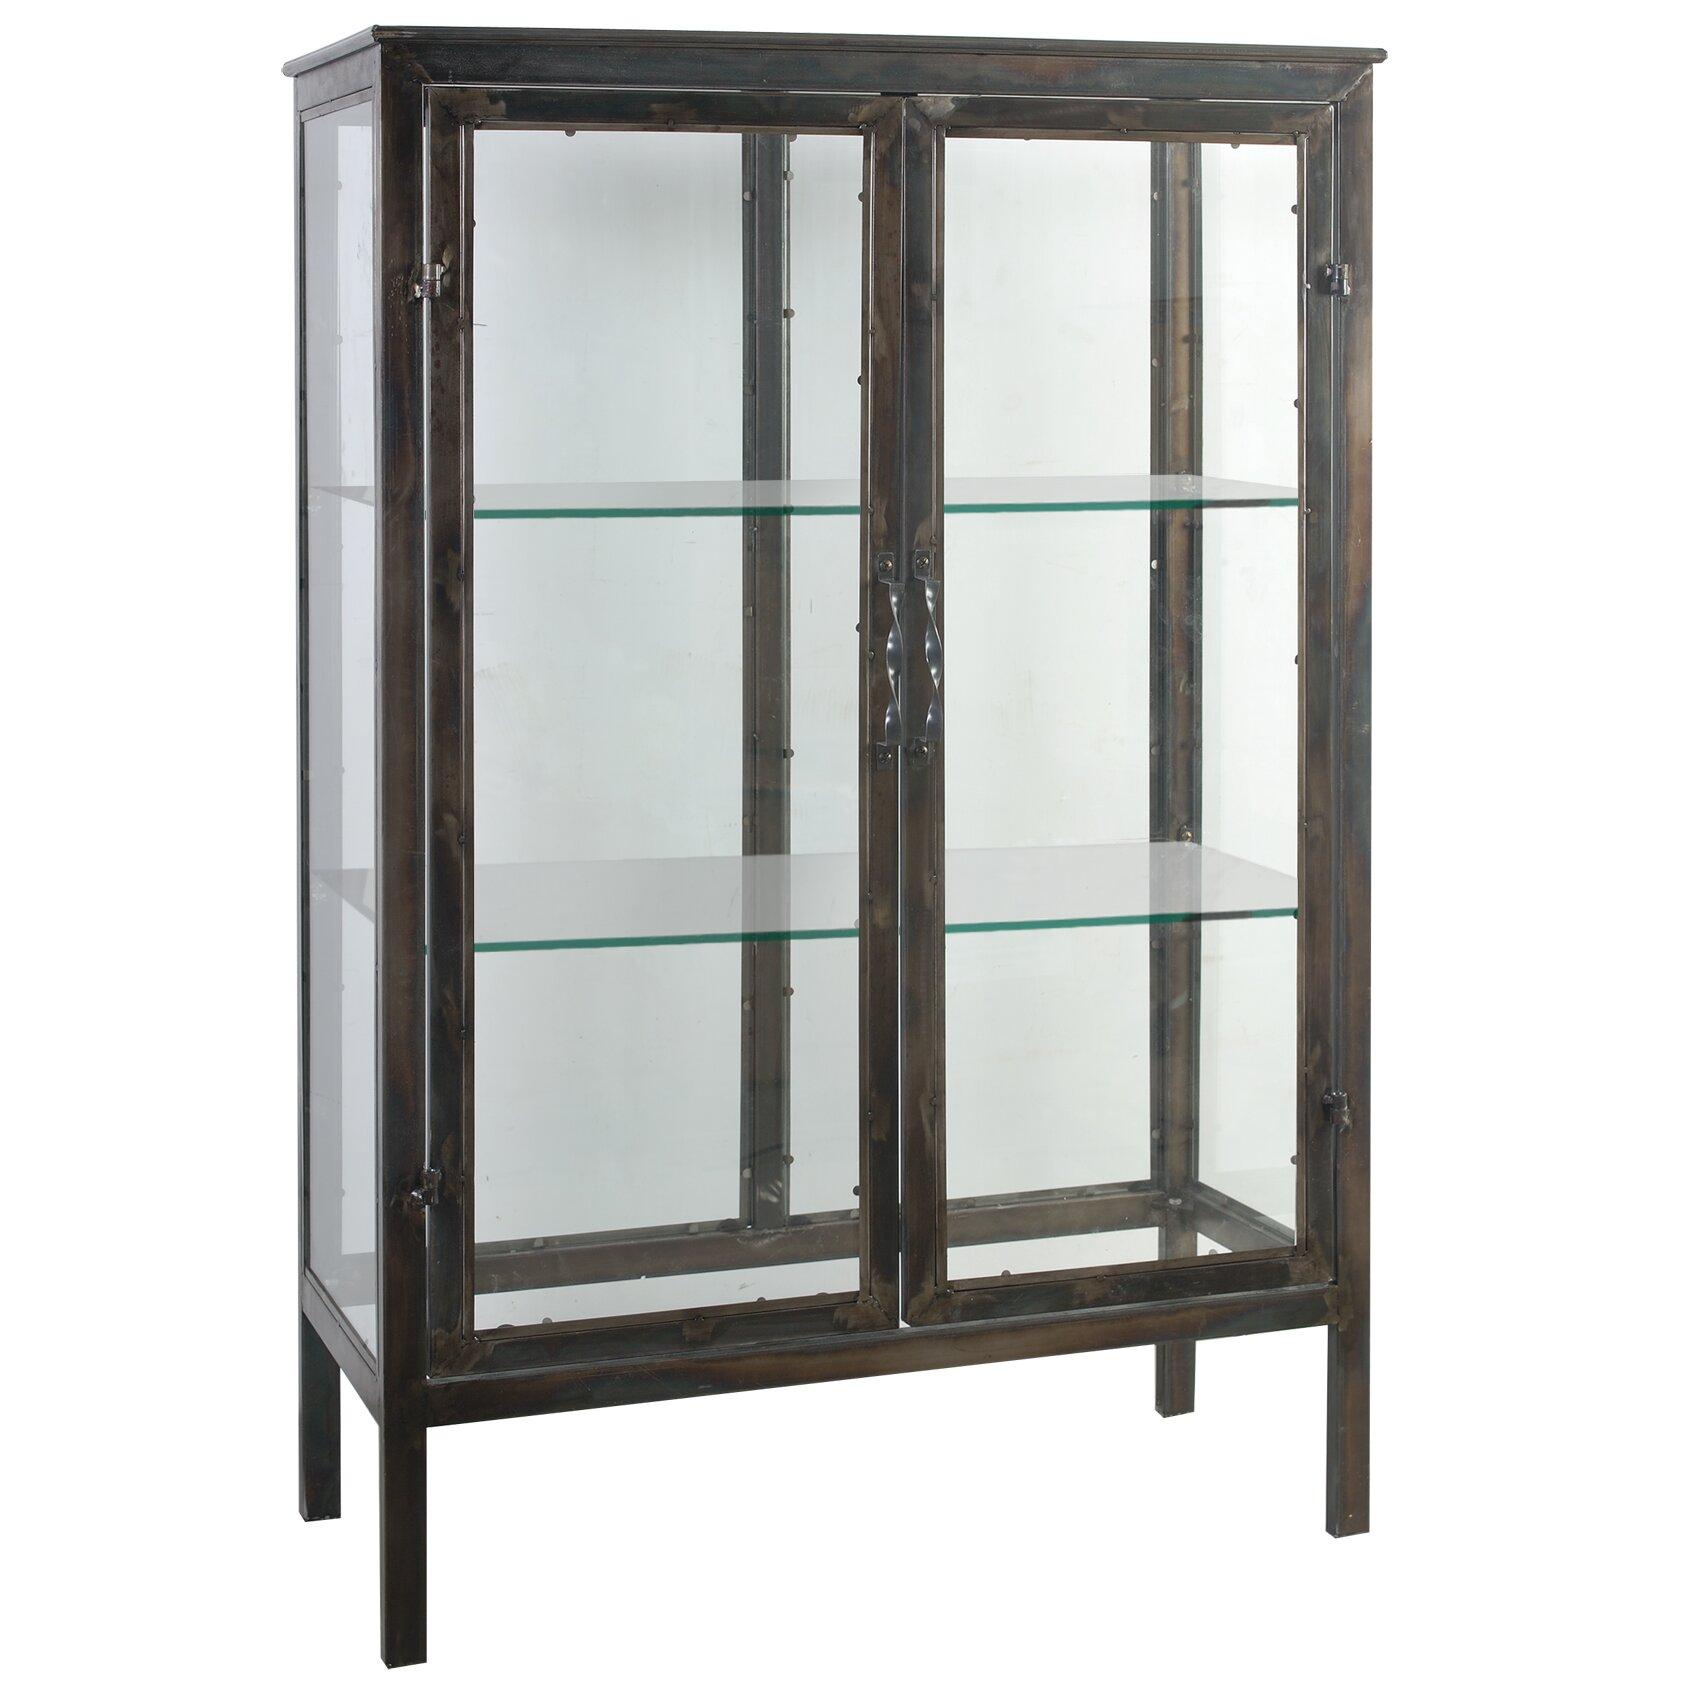 Parnell keepsake display cabinet wayfair for Storage parnell